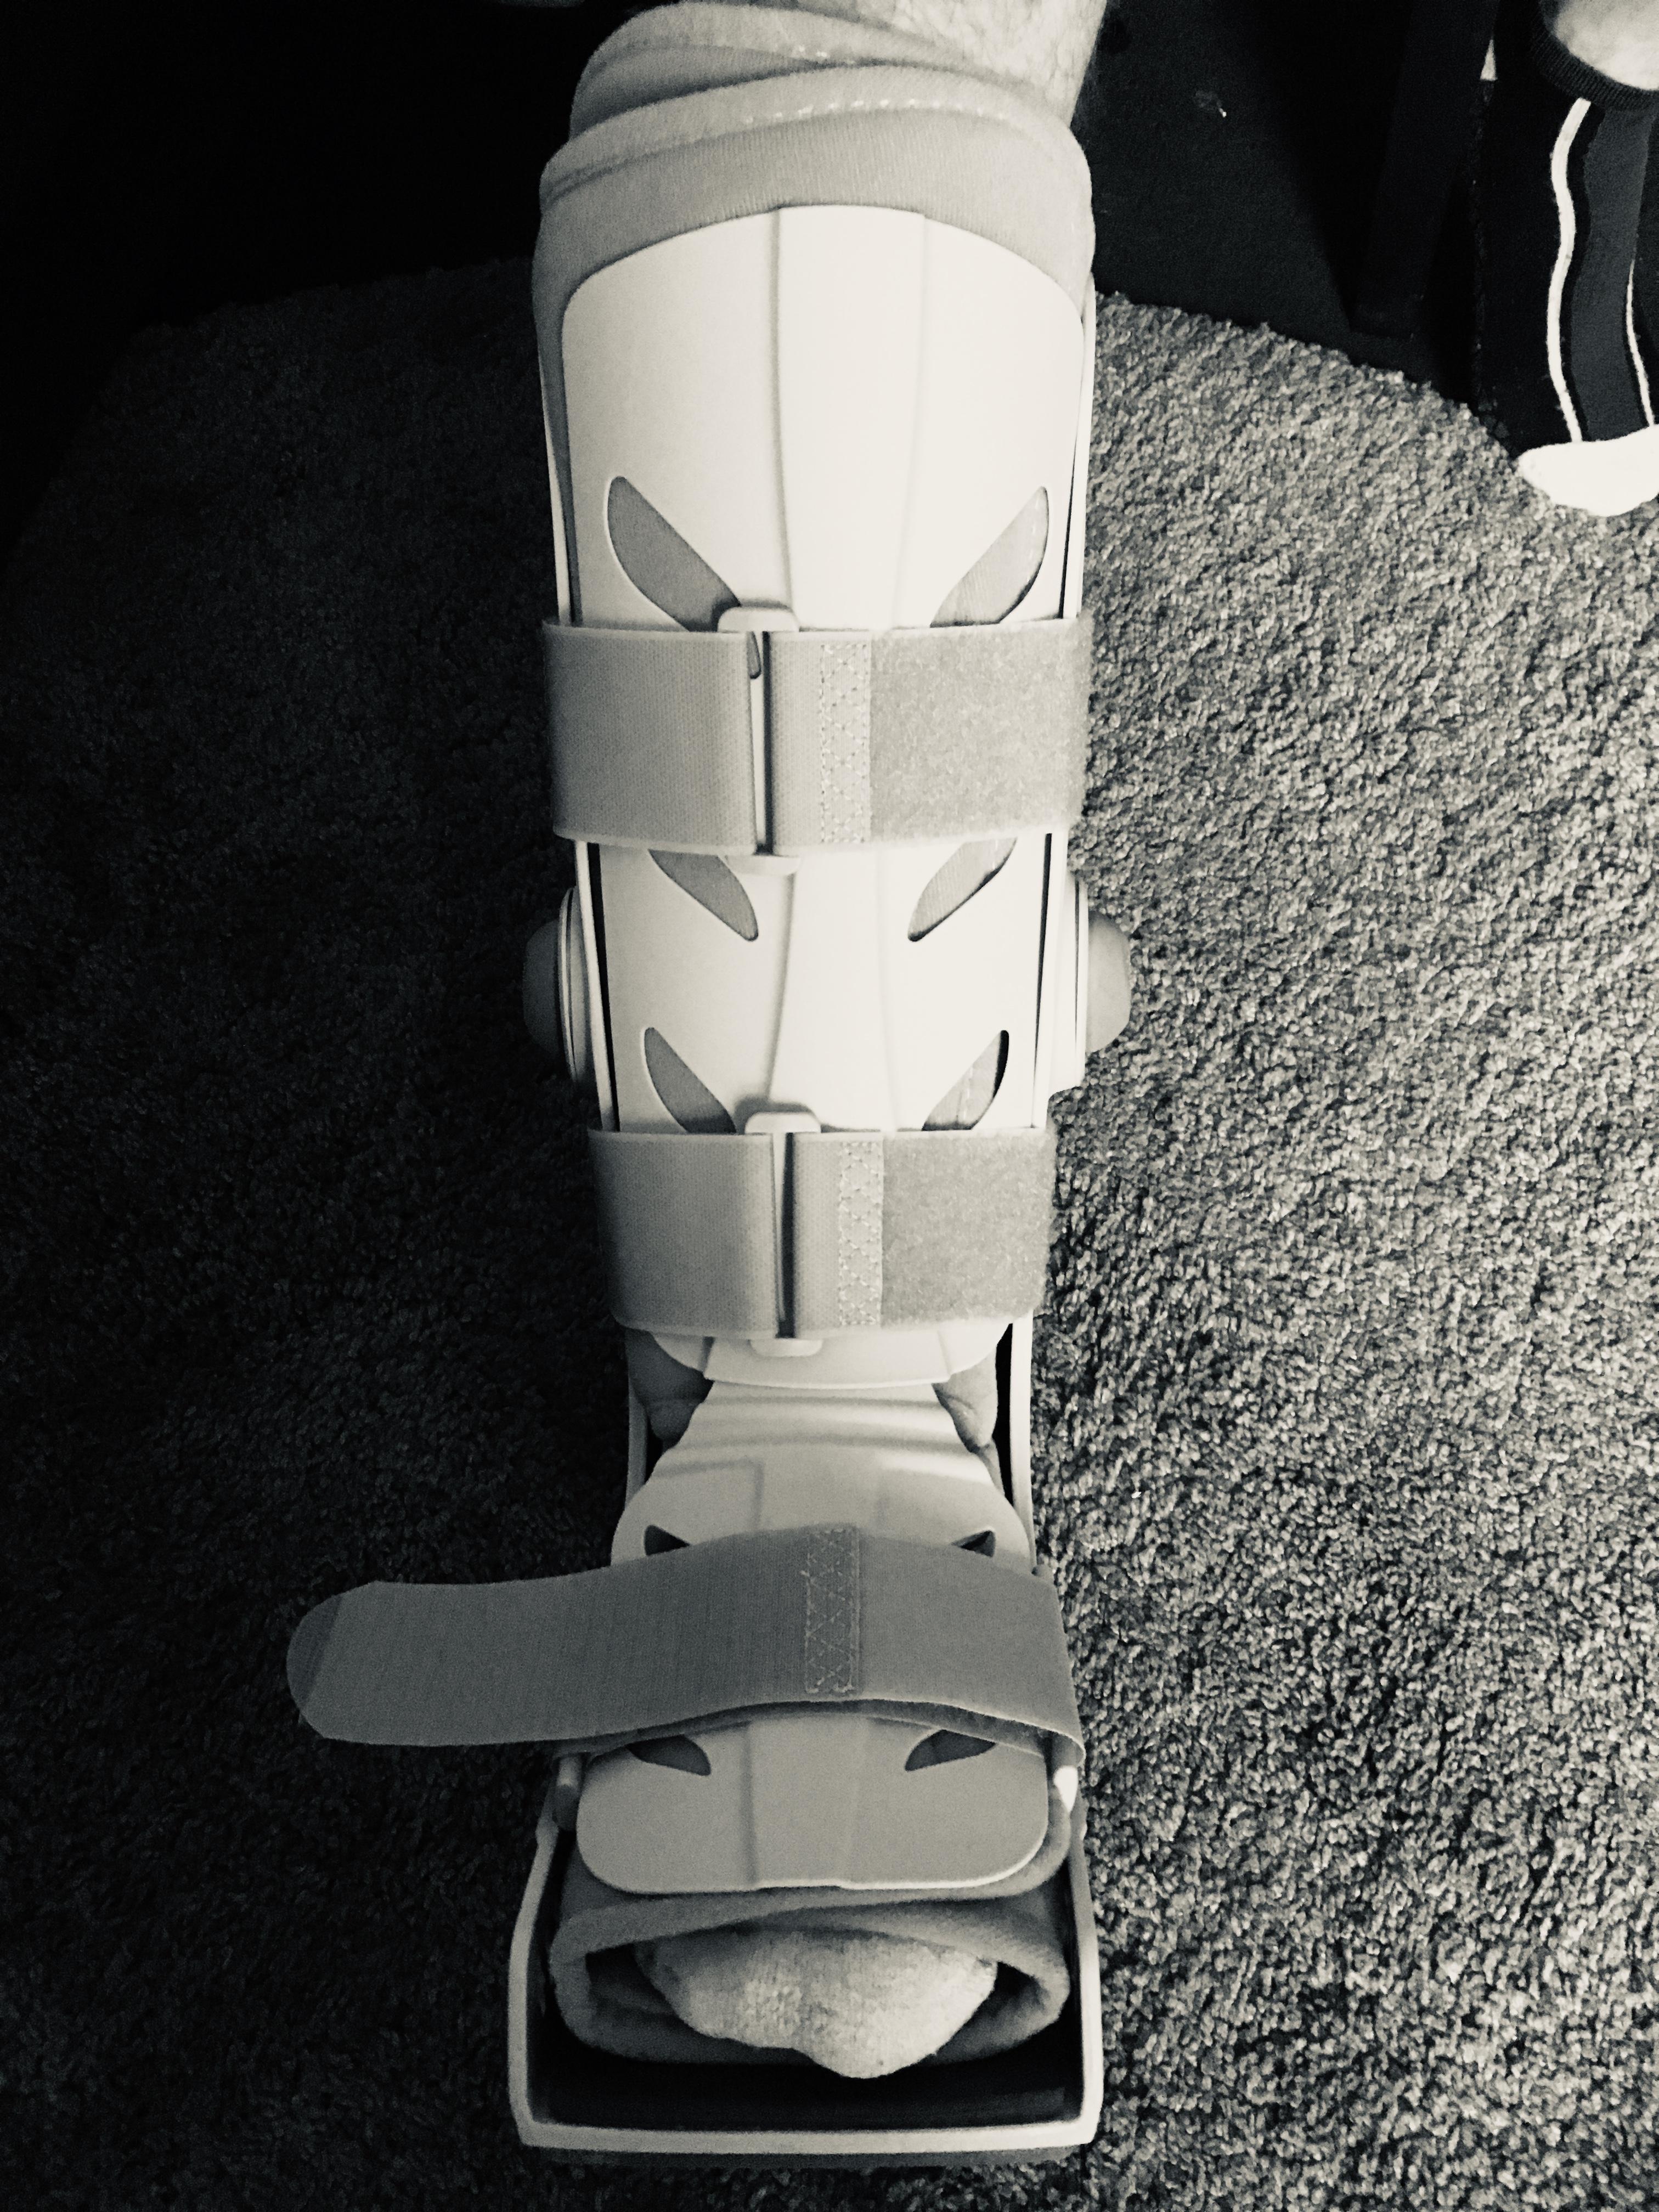 Storm Trooper Moon Boot by Jez Braithwaite